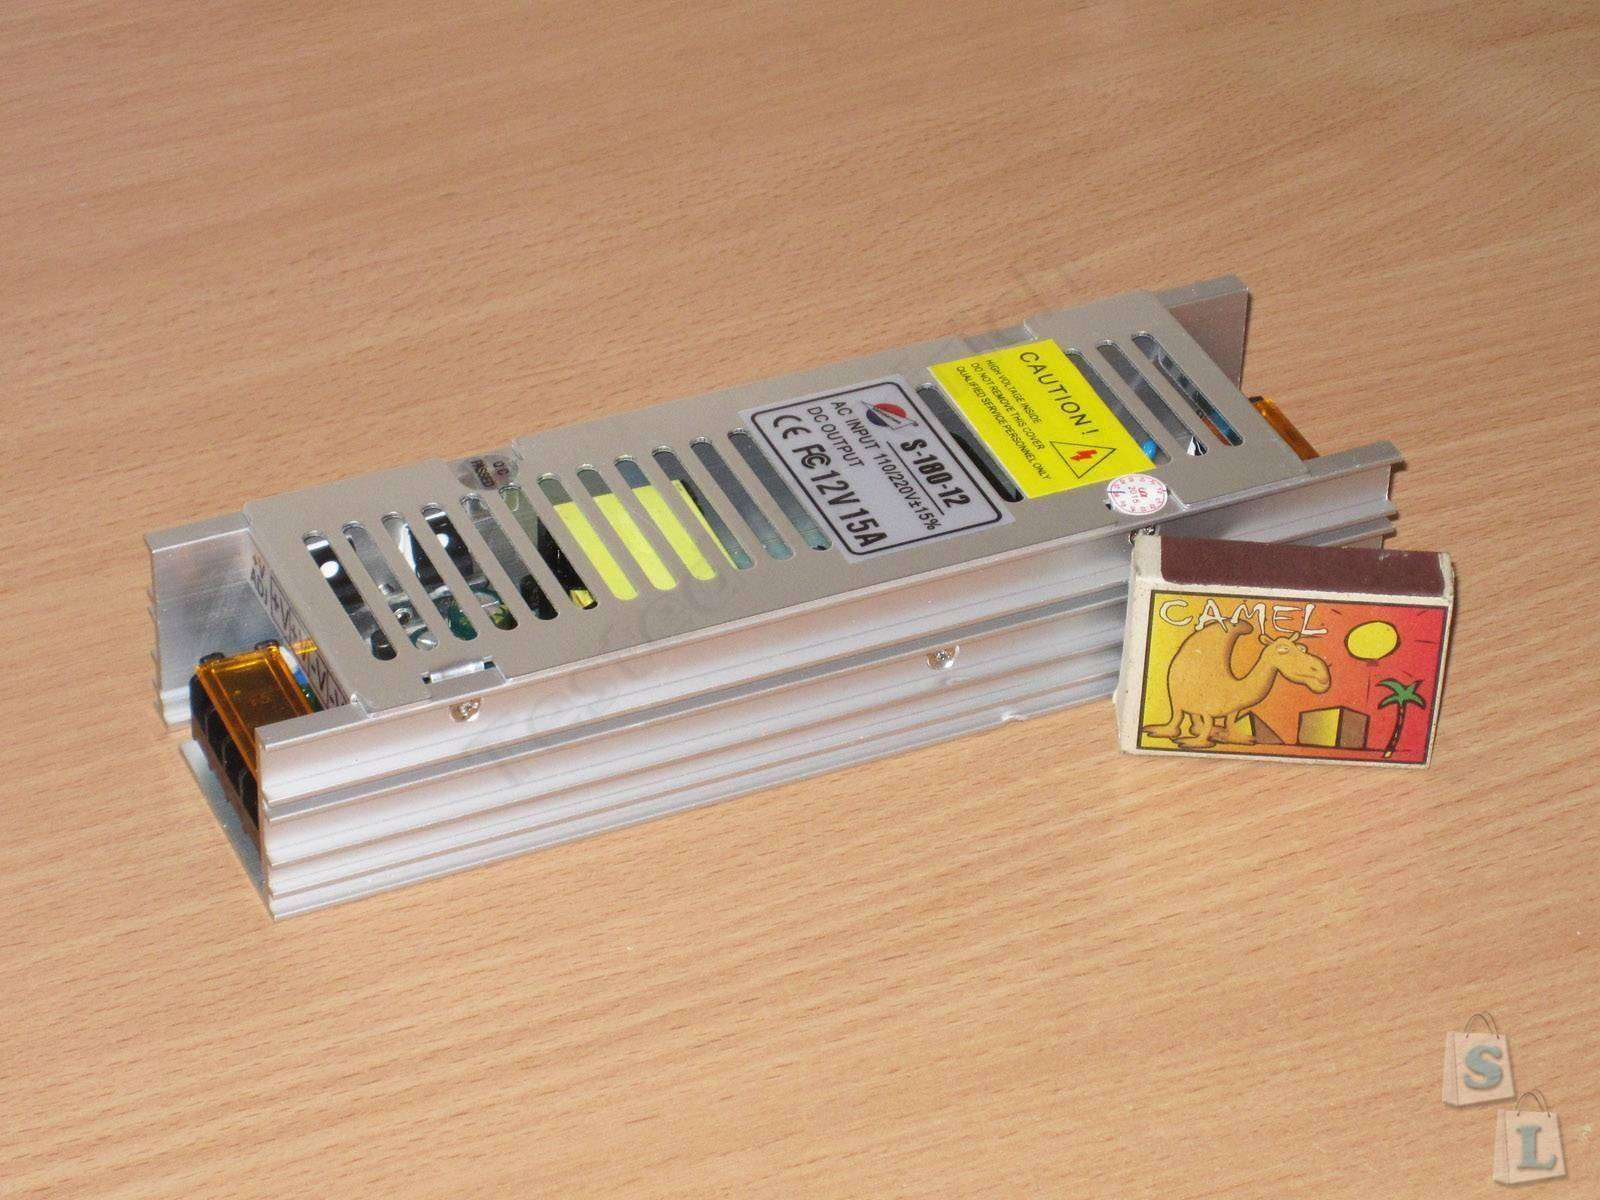 GearBest: S-180-12 180W 12V / 15A блок питания в непривычном формфакторе